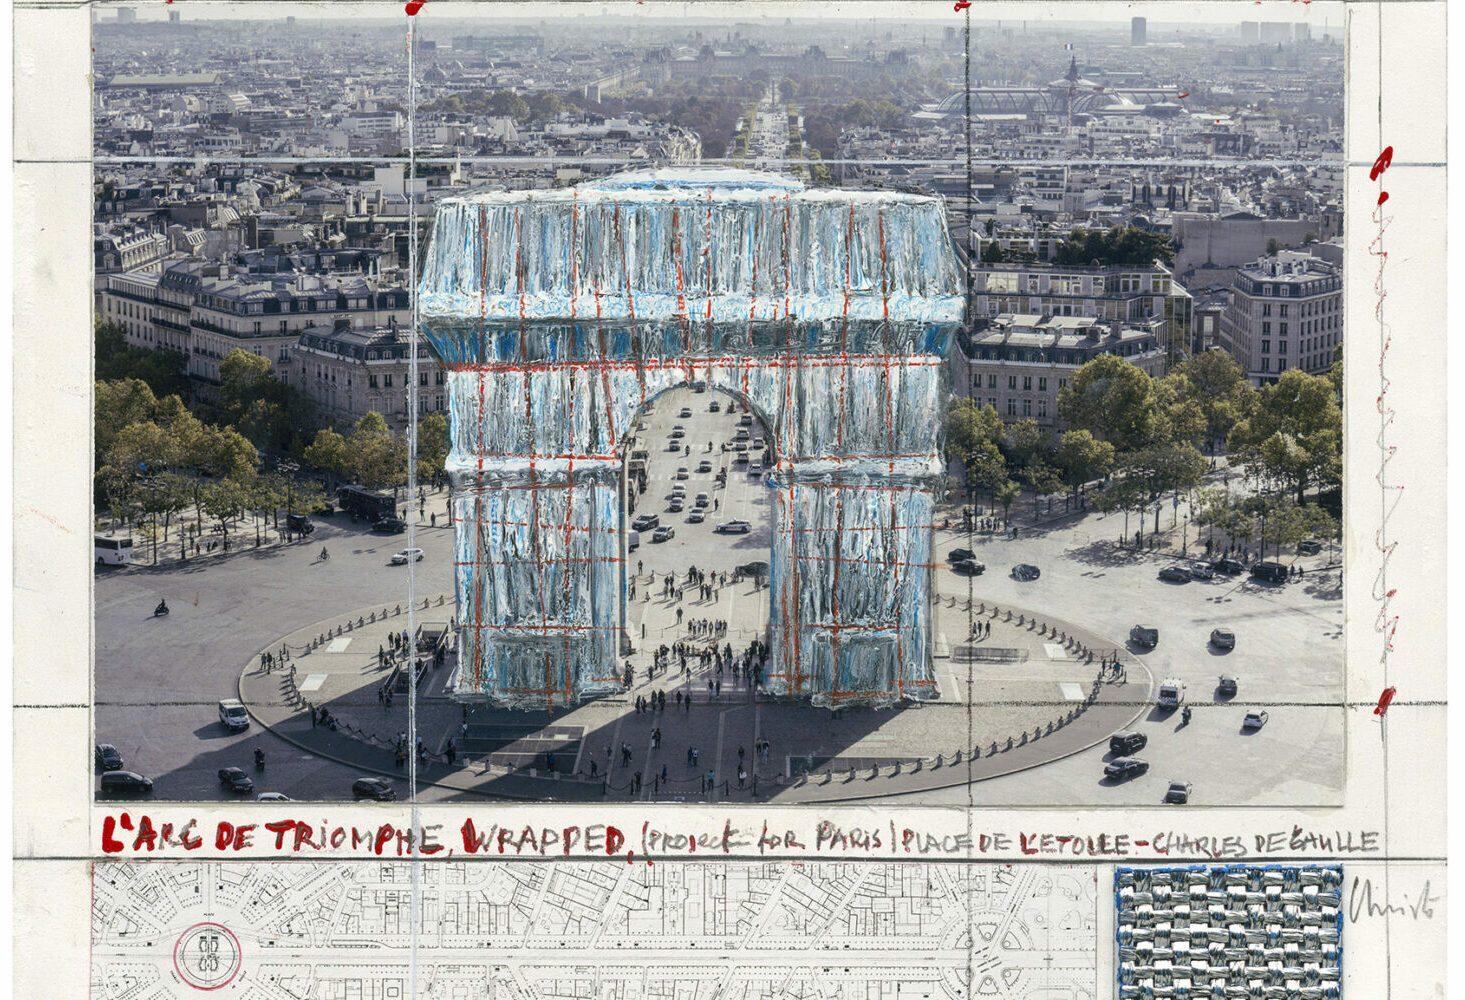 Christo und Jeanne-Claude: Arc de Triomphe (Project for Paris), Pigmentdruck auf Bütten, 50 x 40 cm, limitiert, Auflage 500